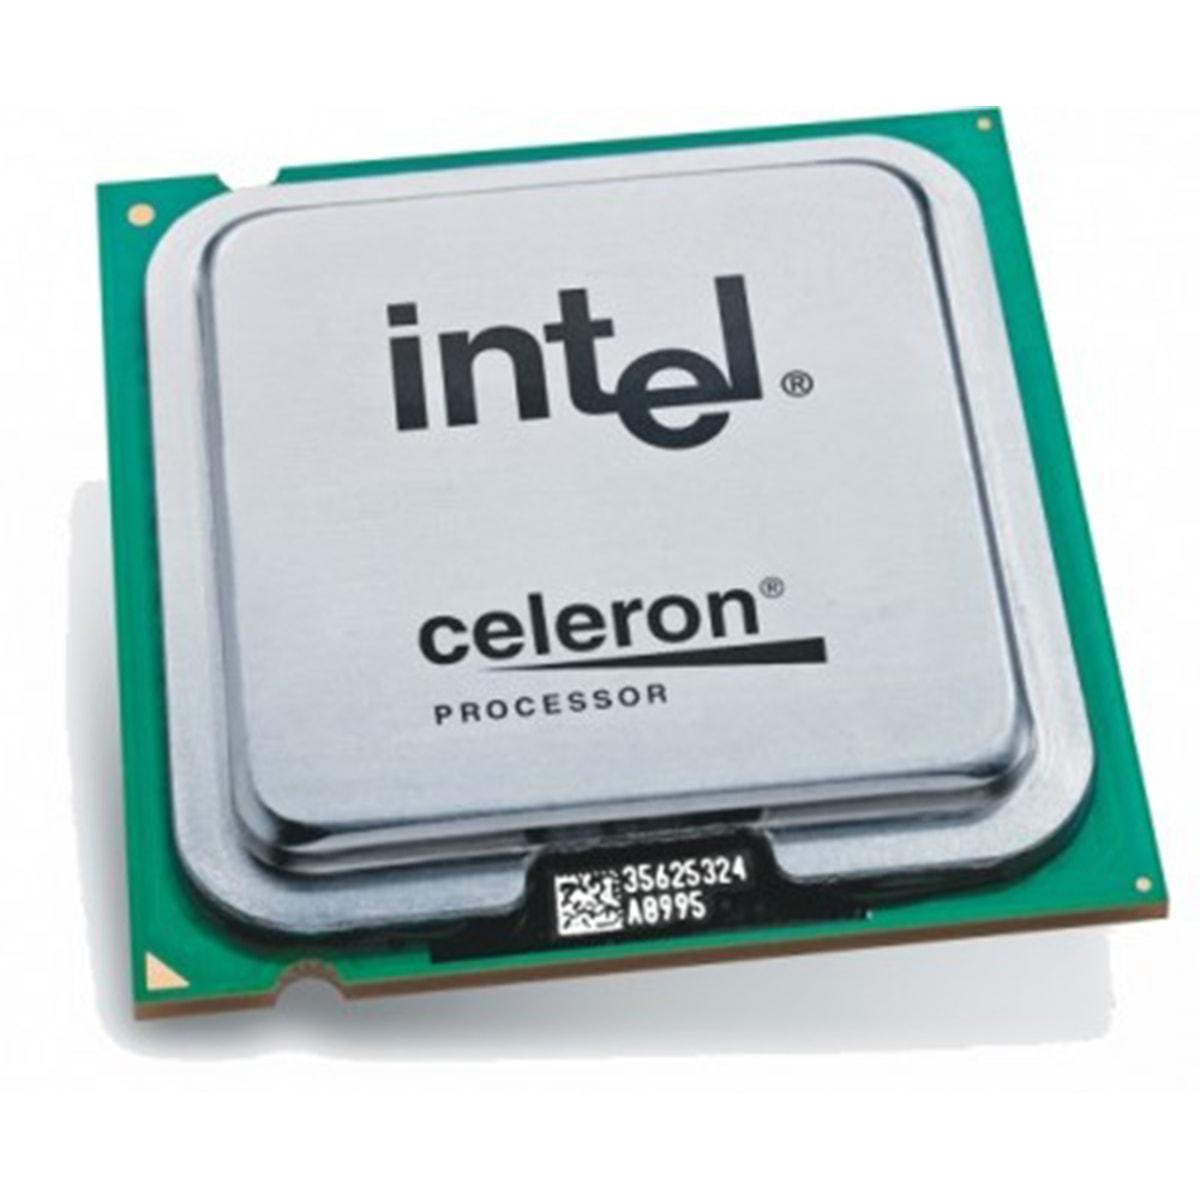 Processador Intel Celeron D 347 3,06 Ghz 512Kb Cache 533MHz - Socket 775 - Seminovo